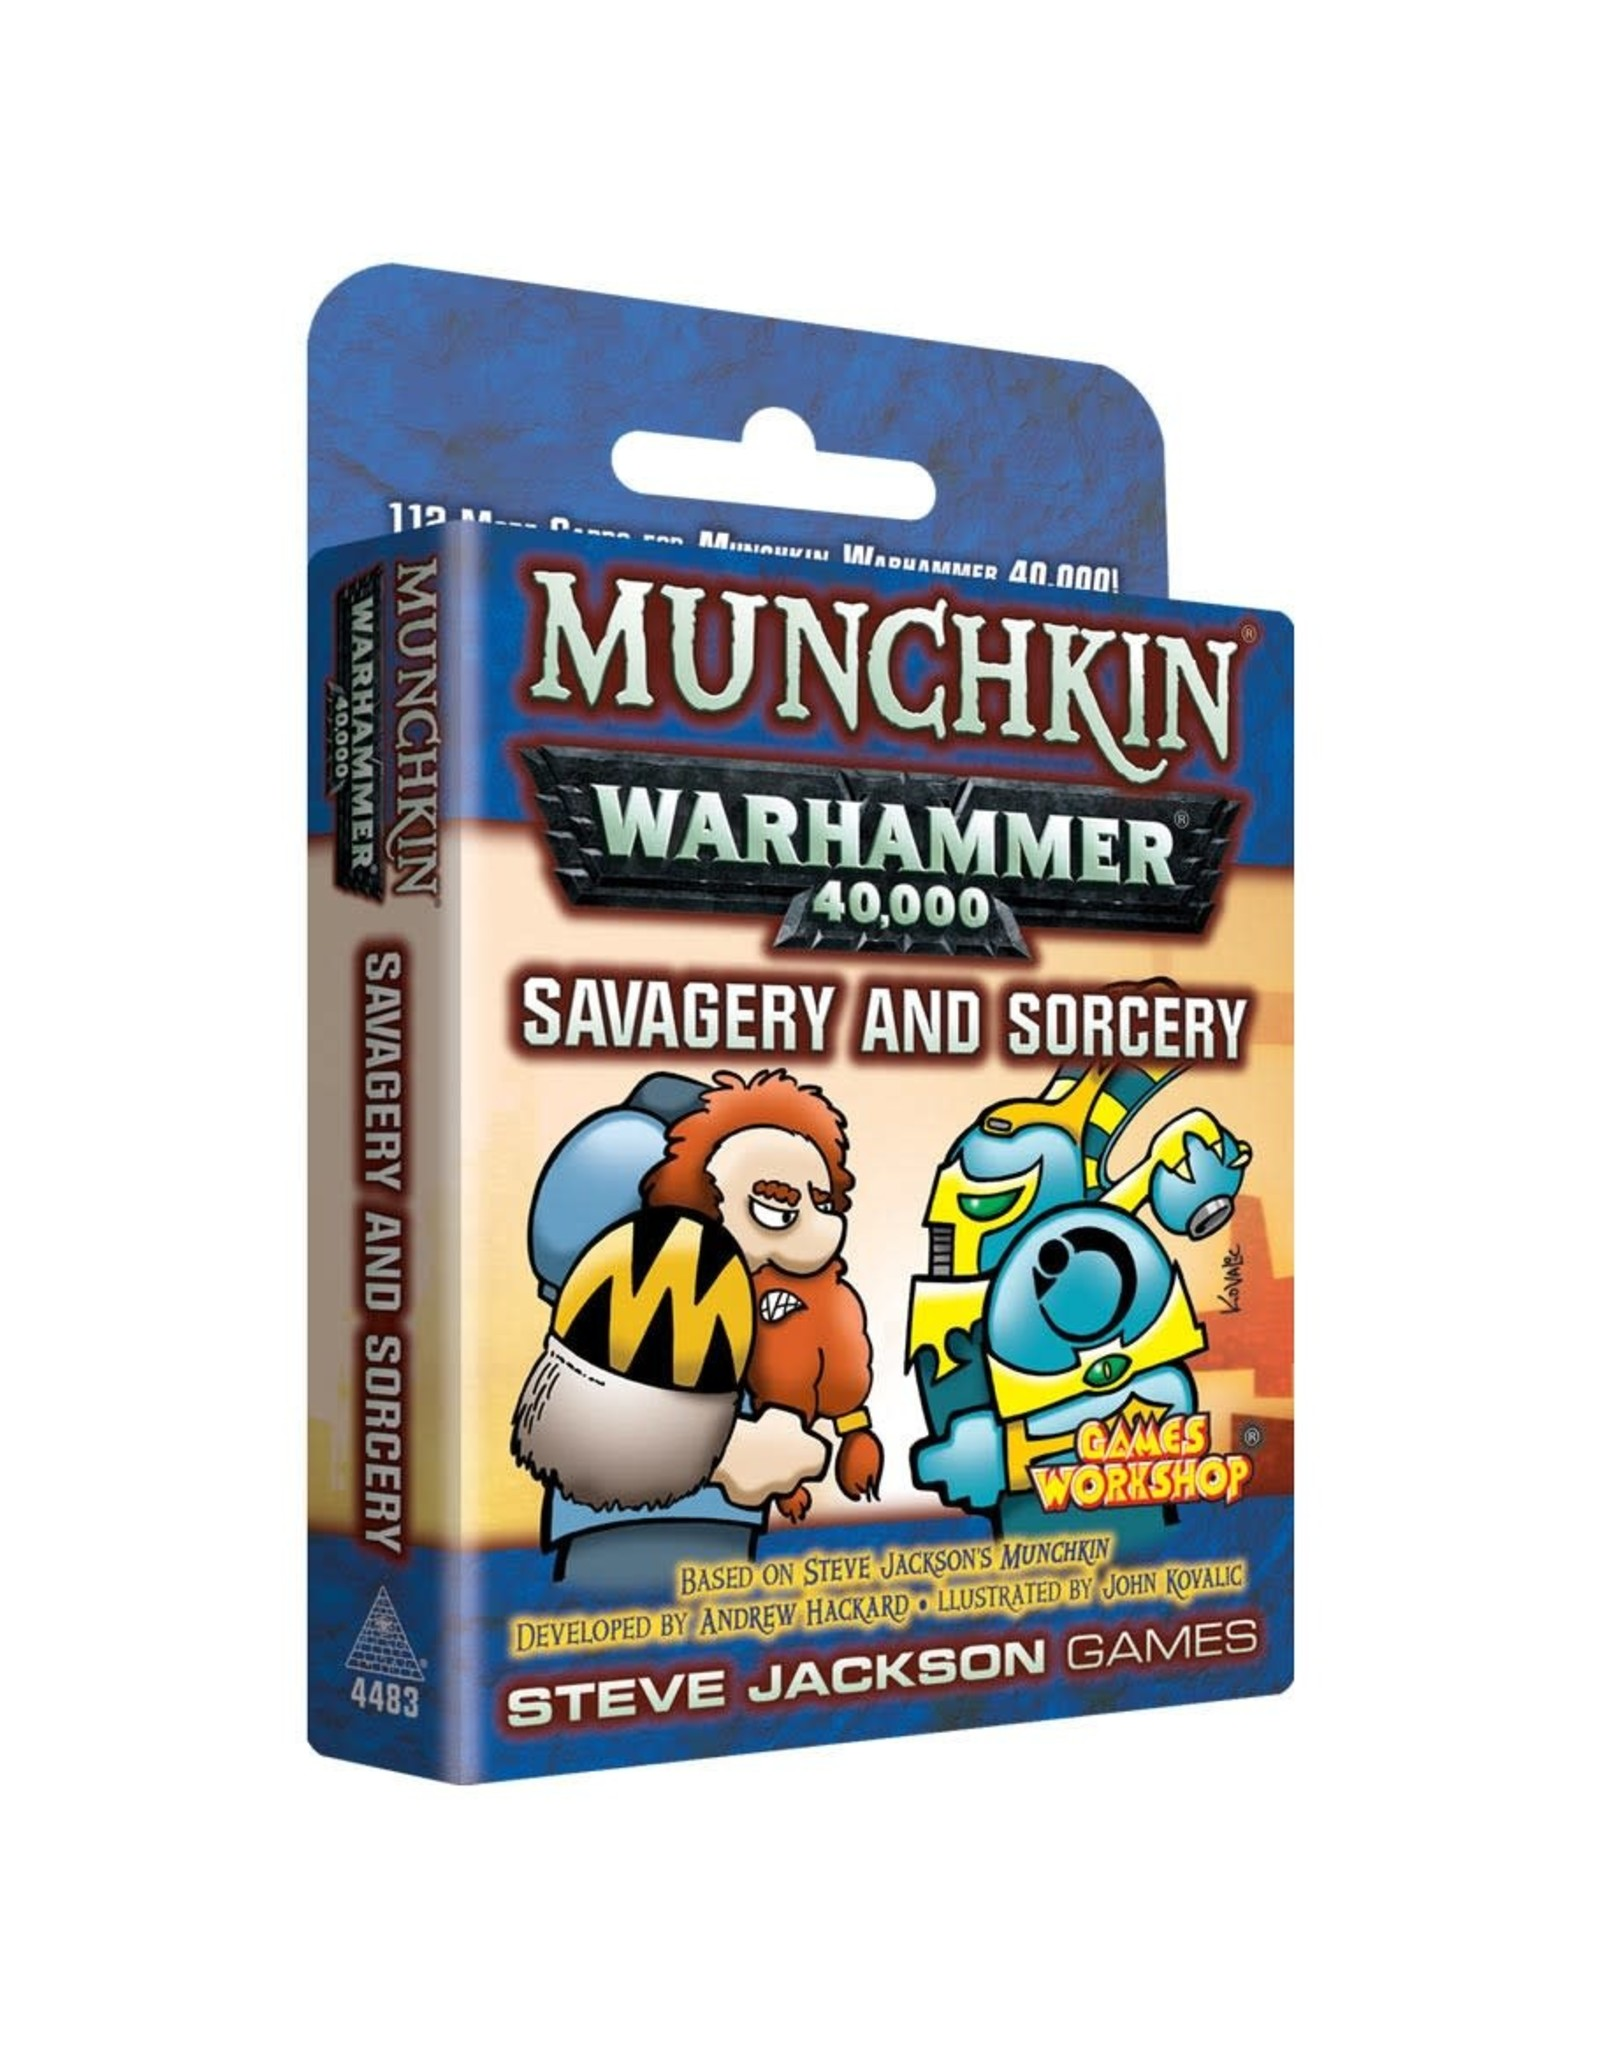 Steve Jackson Games Munchkin: Warhammer 40k Savagery and Sorcery